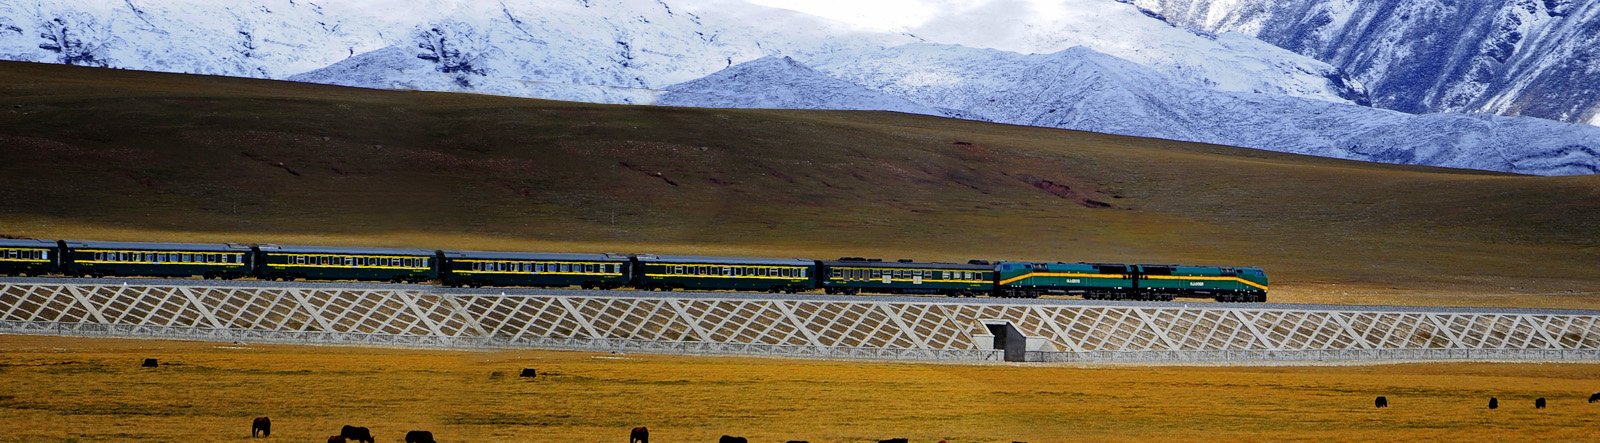 Tibet Group Tour,Tibet Railway Travel